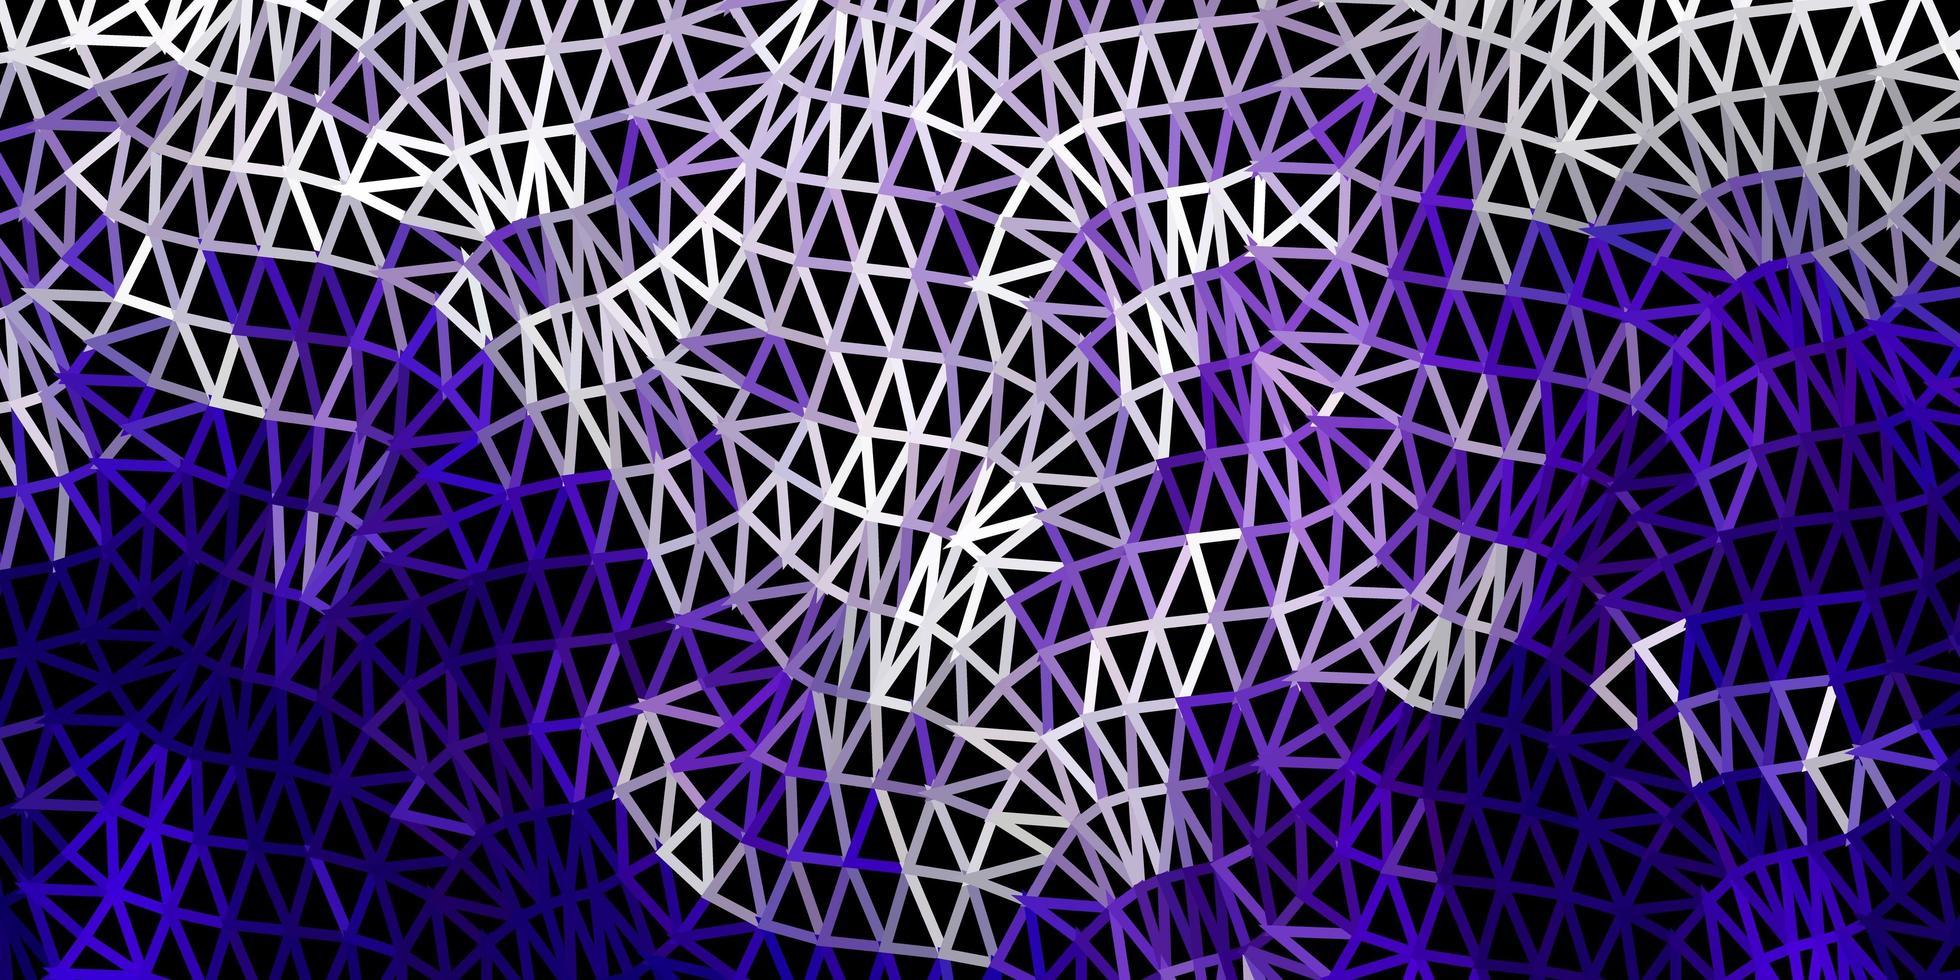 donkerpaars vector abstract driehoeksjabloon.